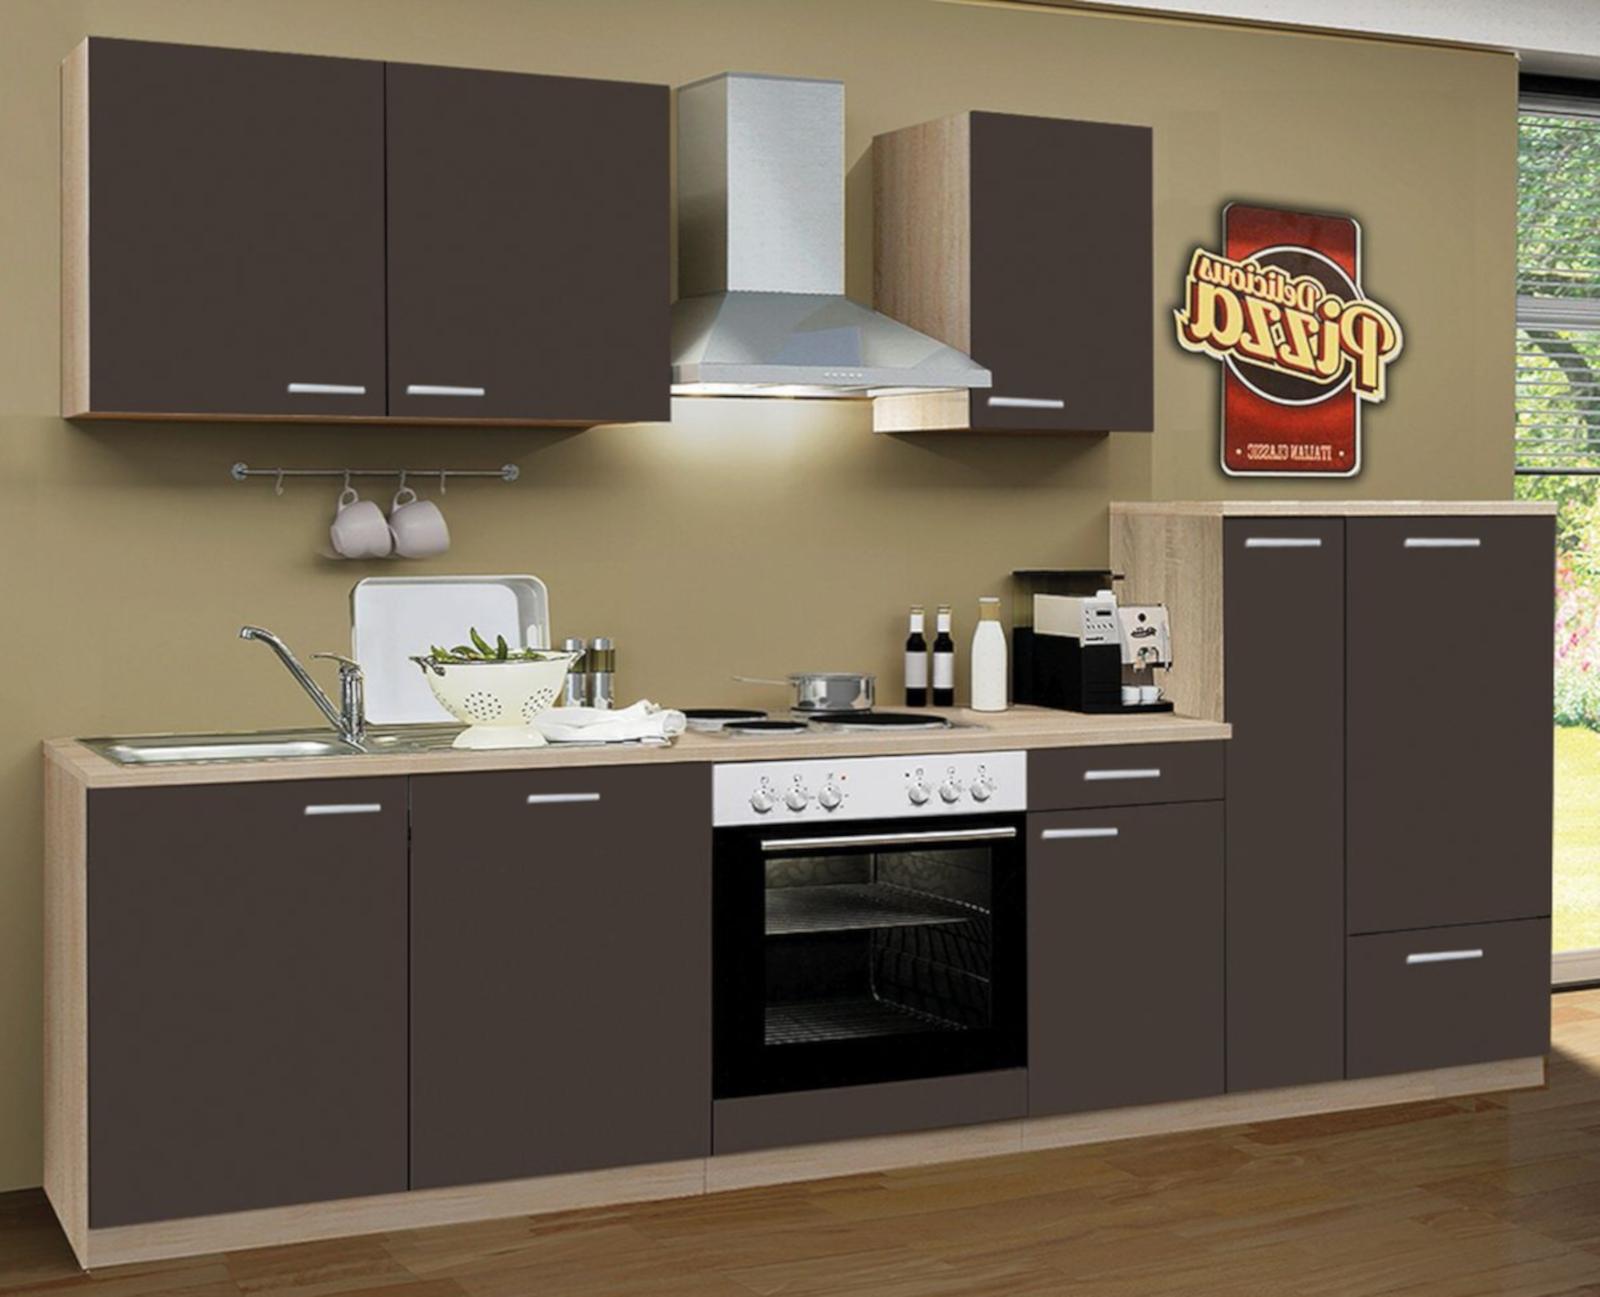 einbauk che grau 300cm e ger te geschirrsp hler. Black Bedroom Furniture Sets. Home Design Ideas